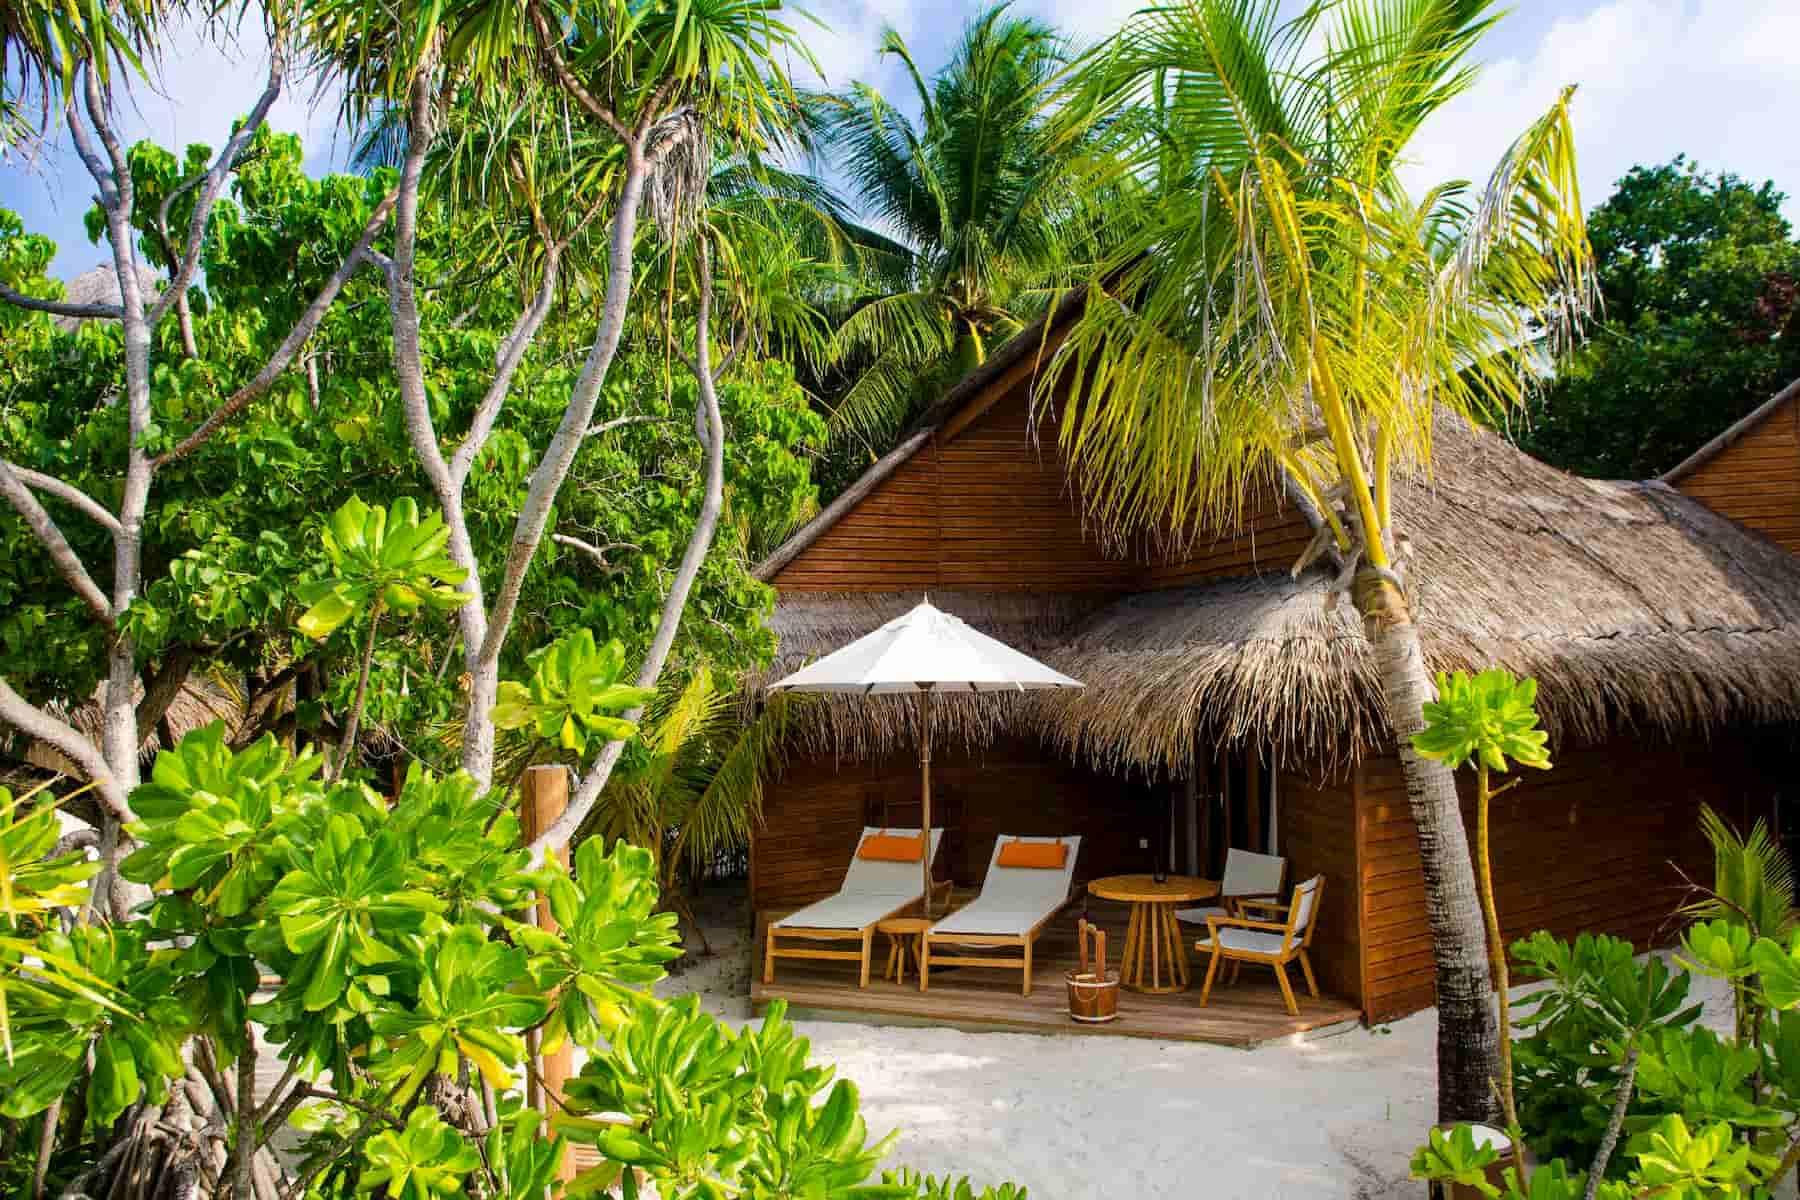 Resort Maldive Mirihi Island Resort beach villa